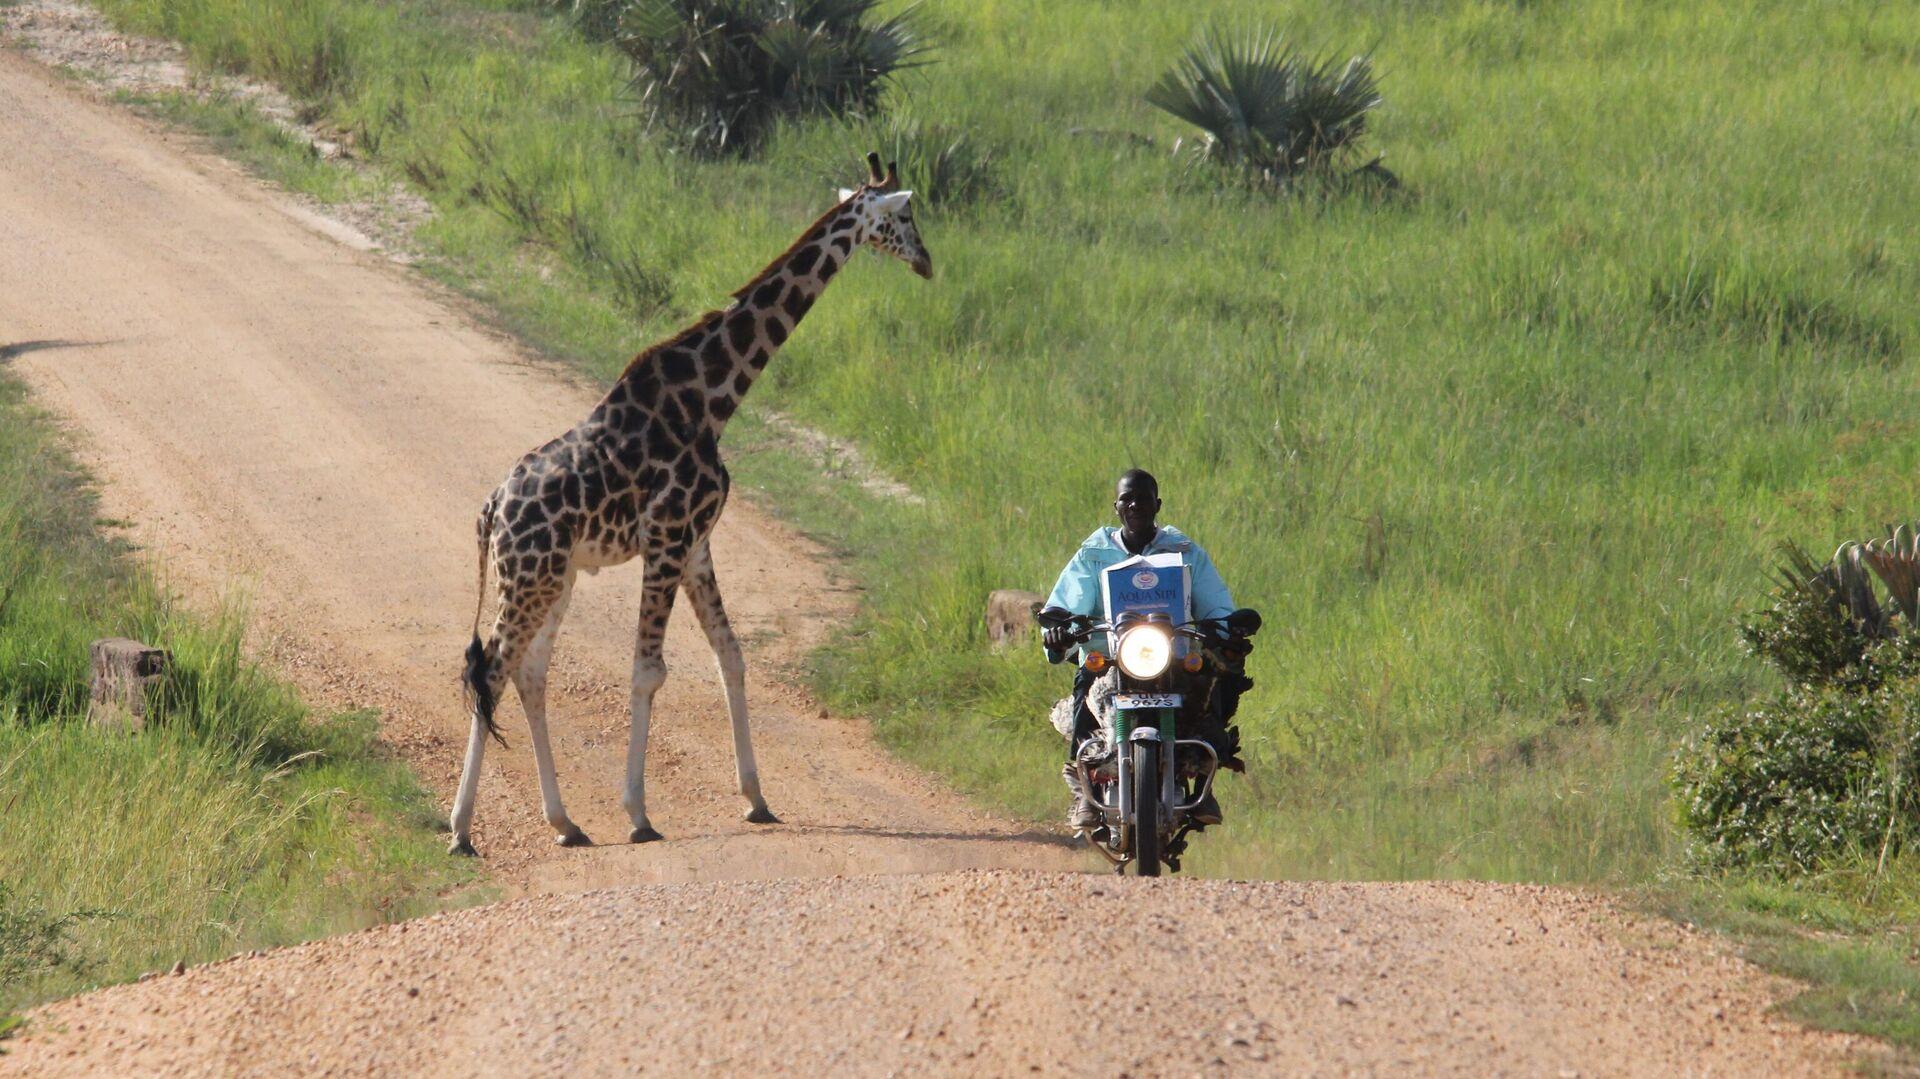 Мотоциклист проезжает мимо жирафа в Уганде - РИА Новости, 1920, 14.10.2020